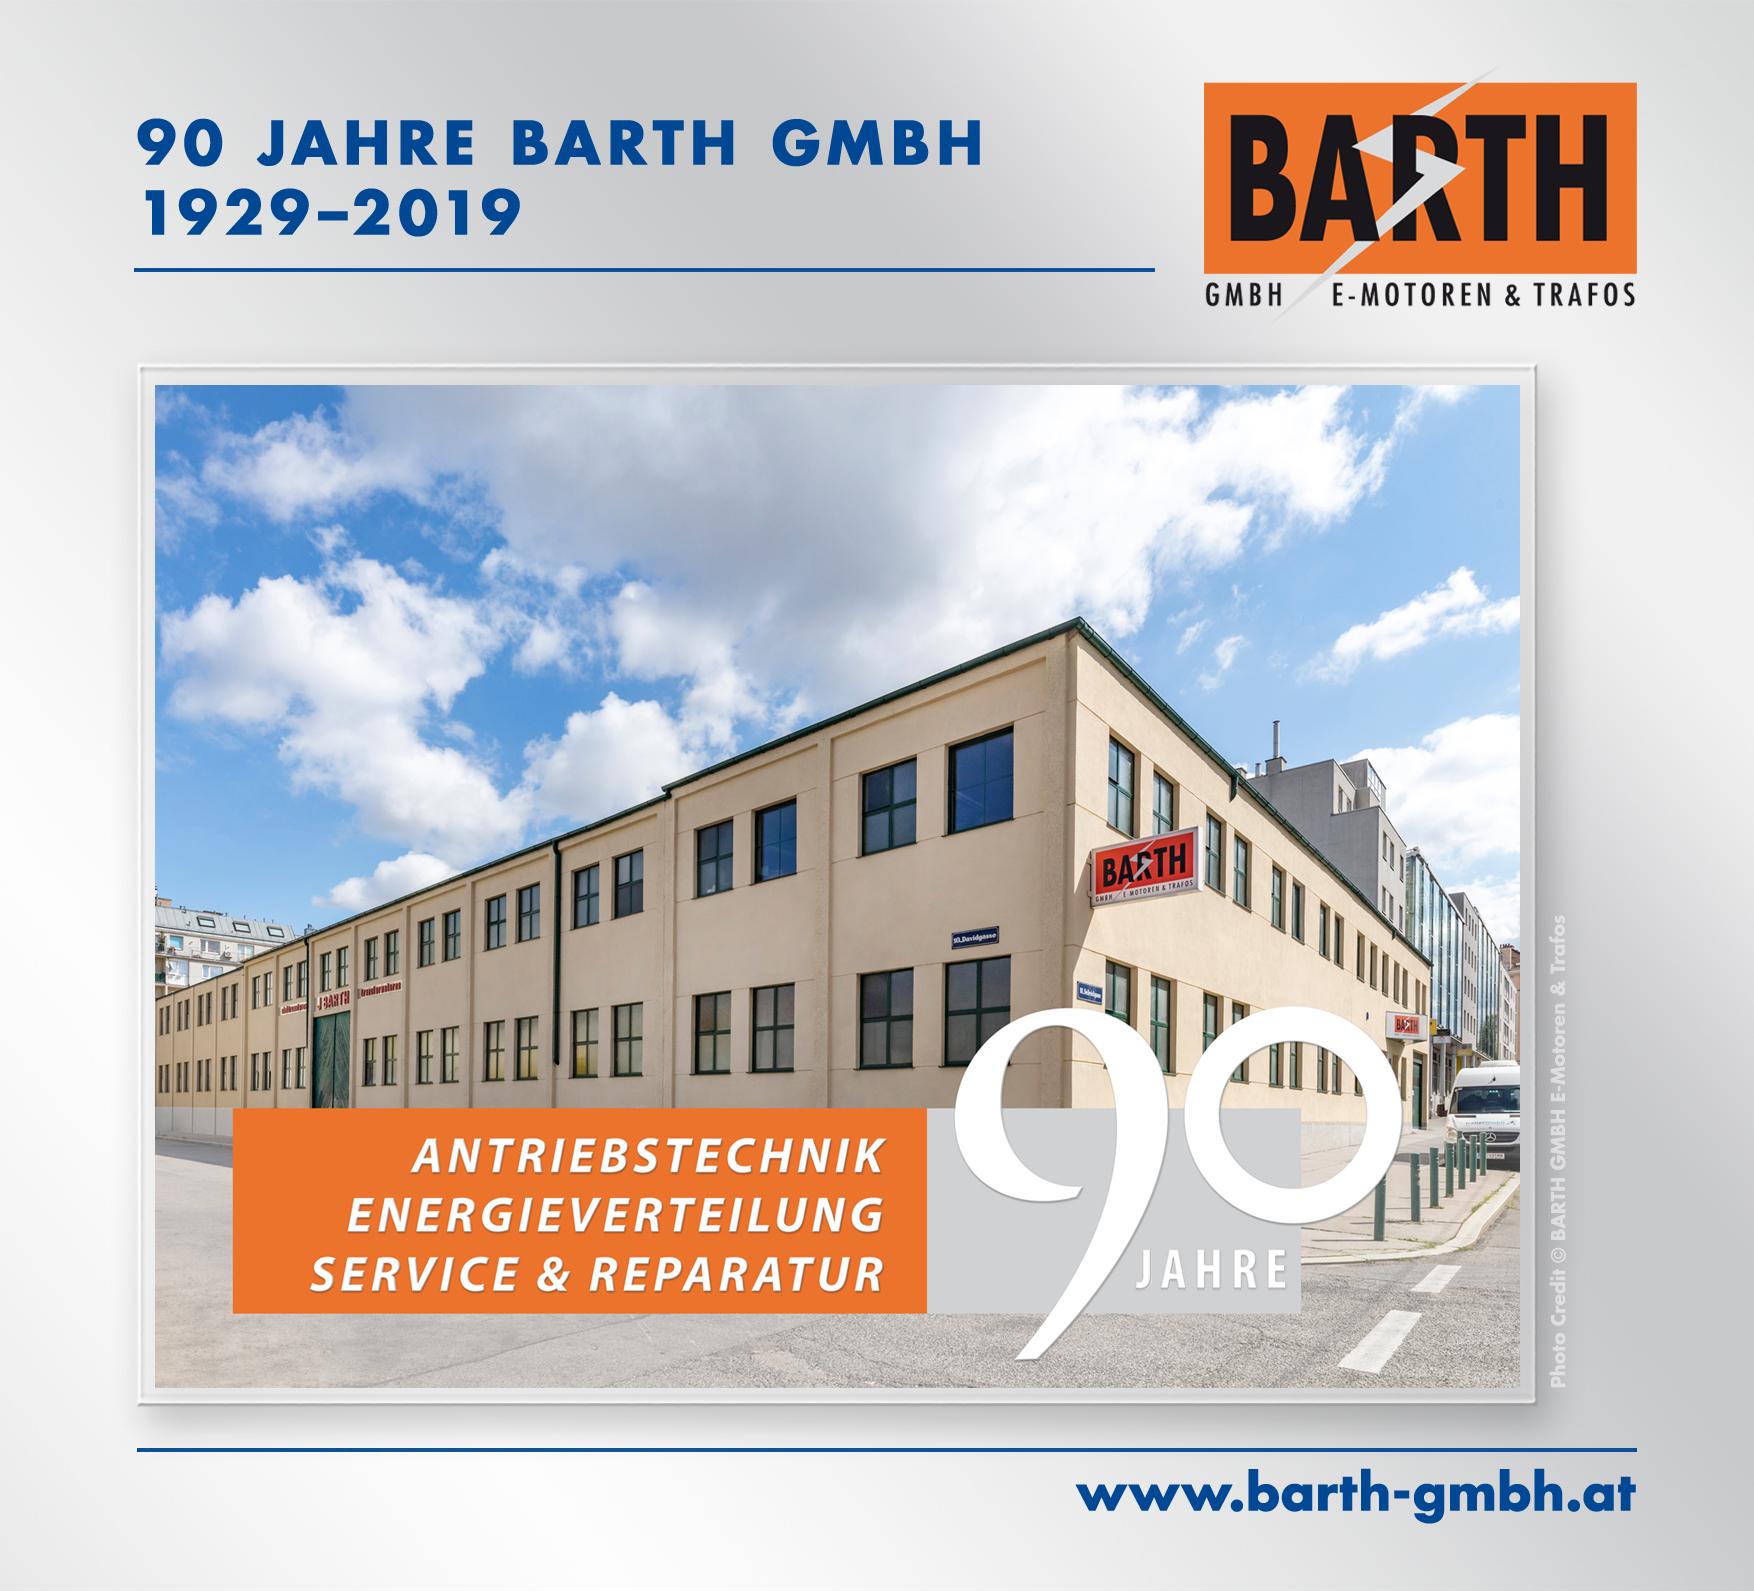 90 Jahre BARTH GMBH